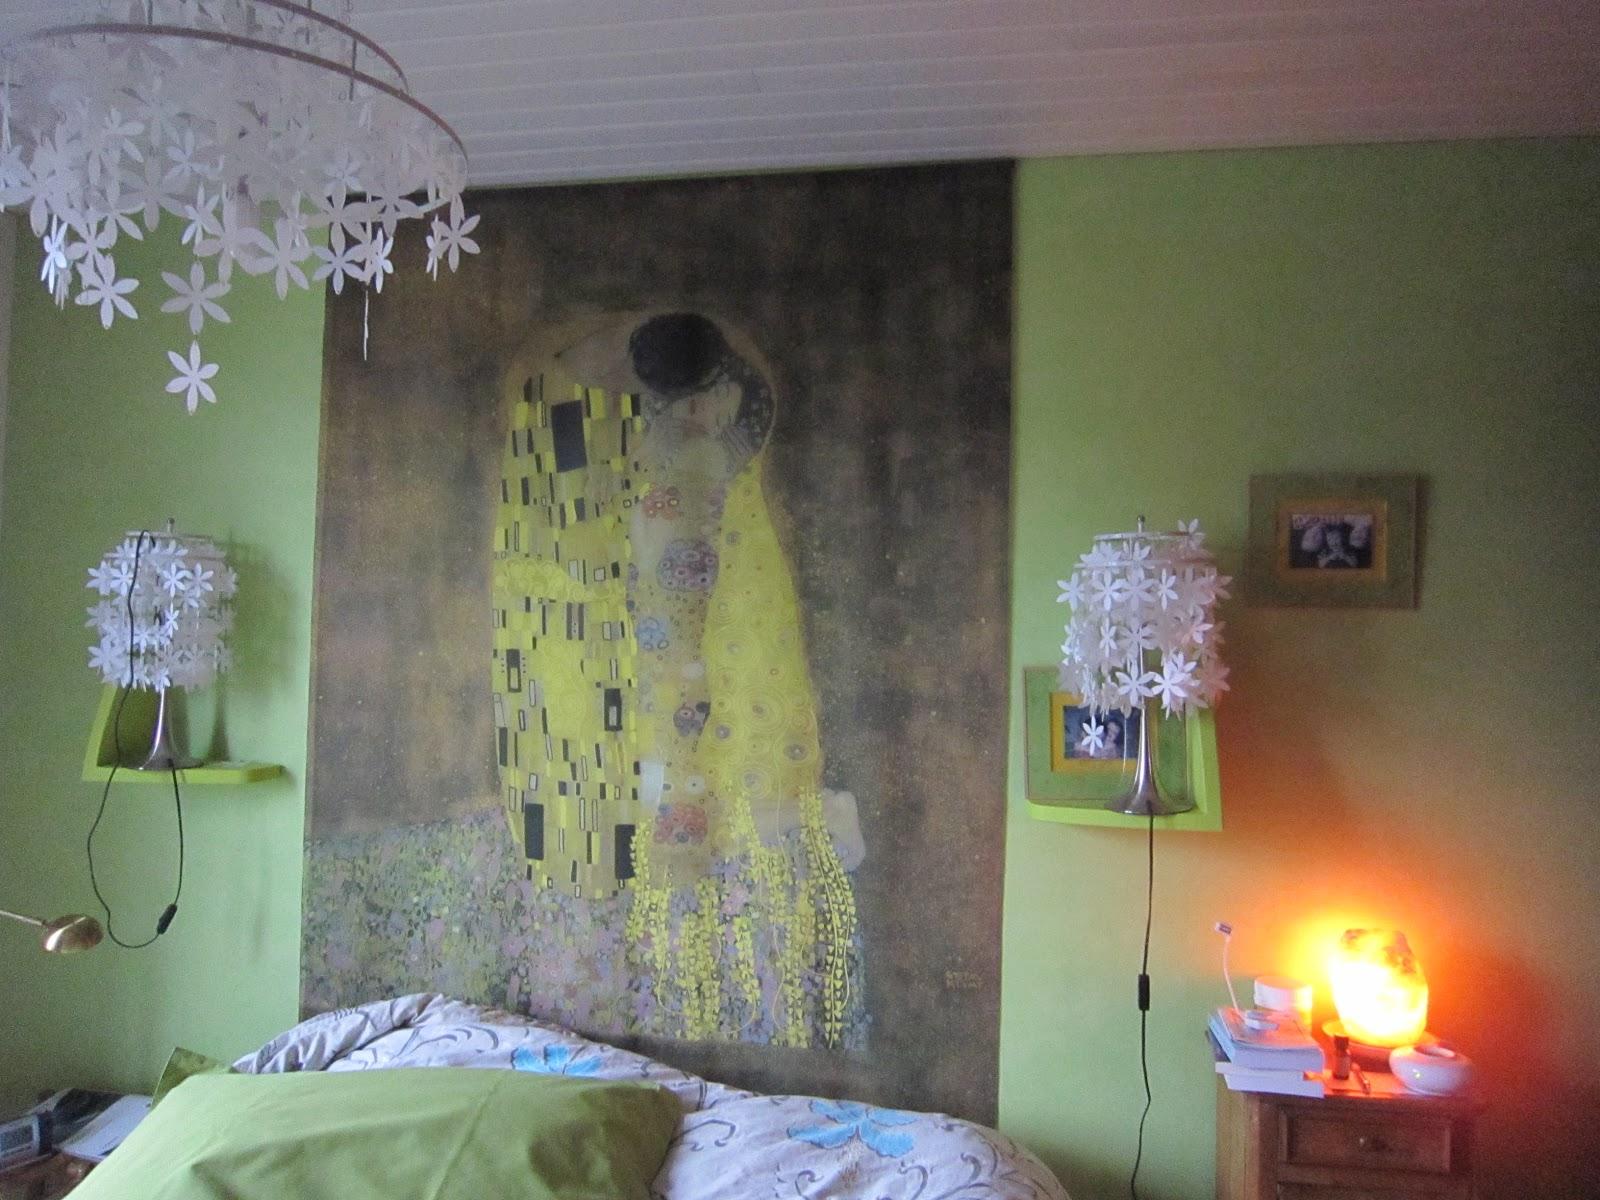 Stunning le bleu dans une chambre feng shui photos for Chambre bleu